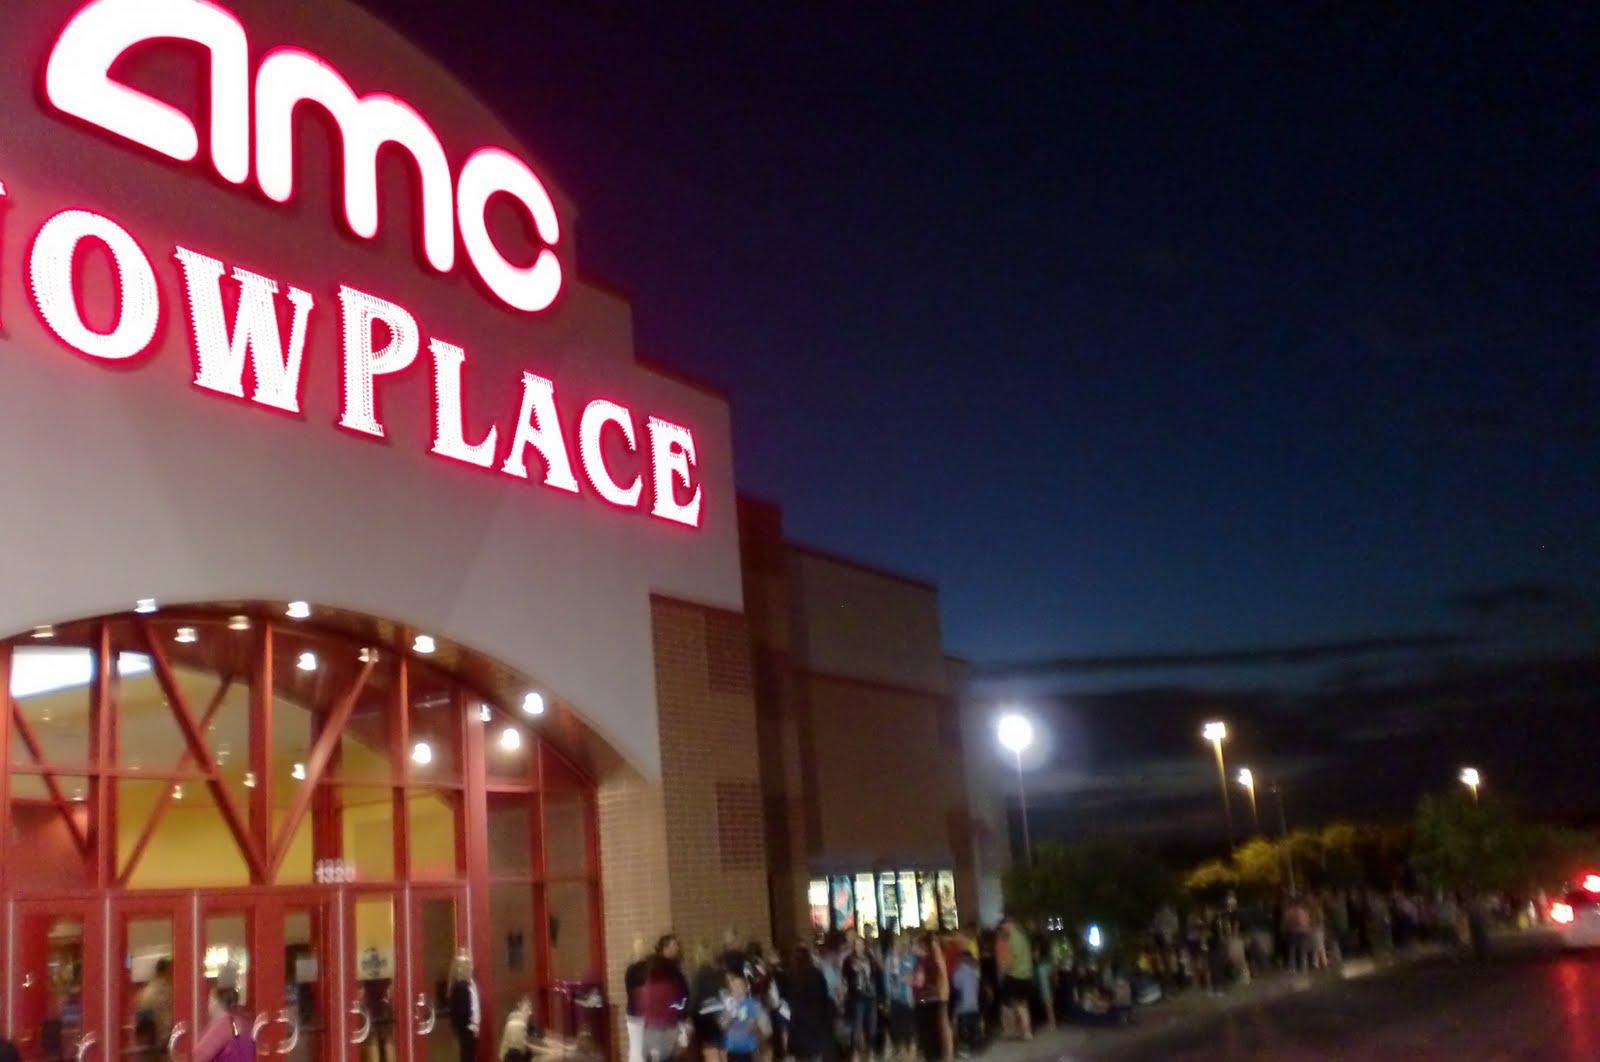 Amc Palace 16